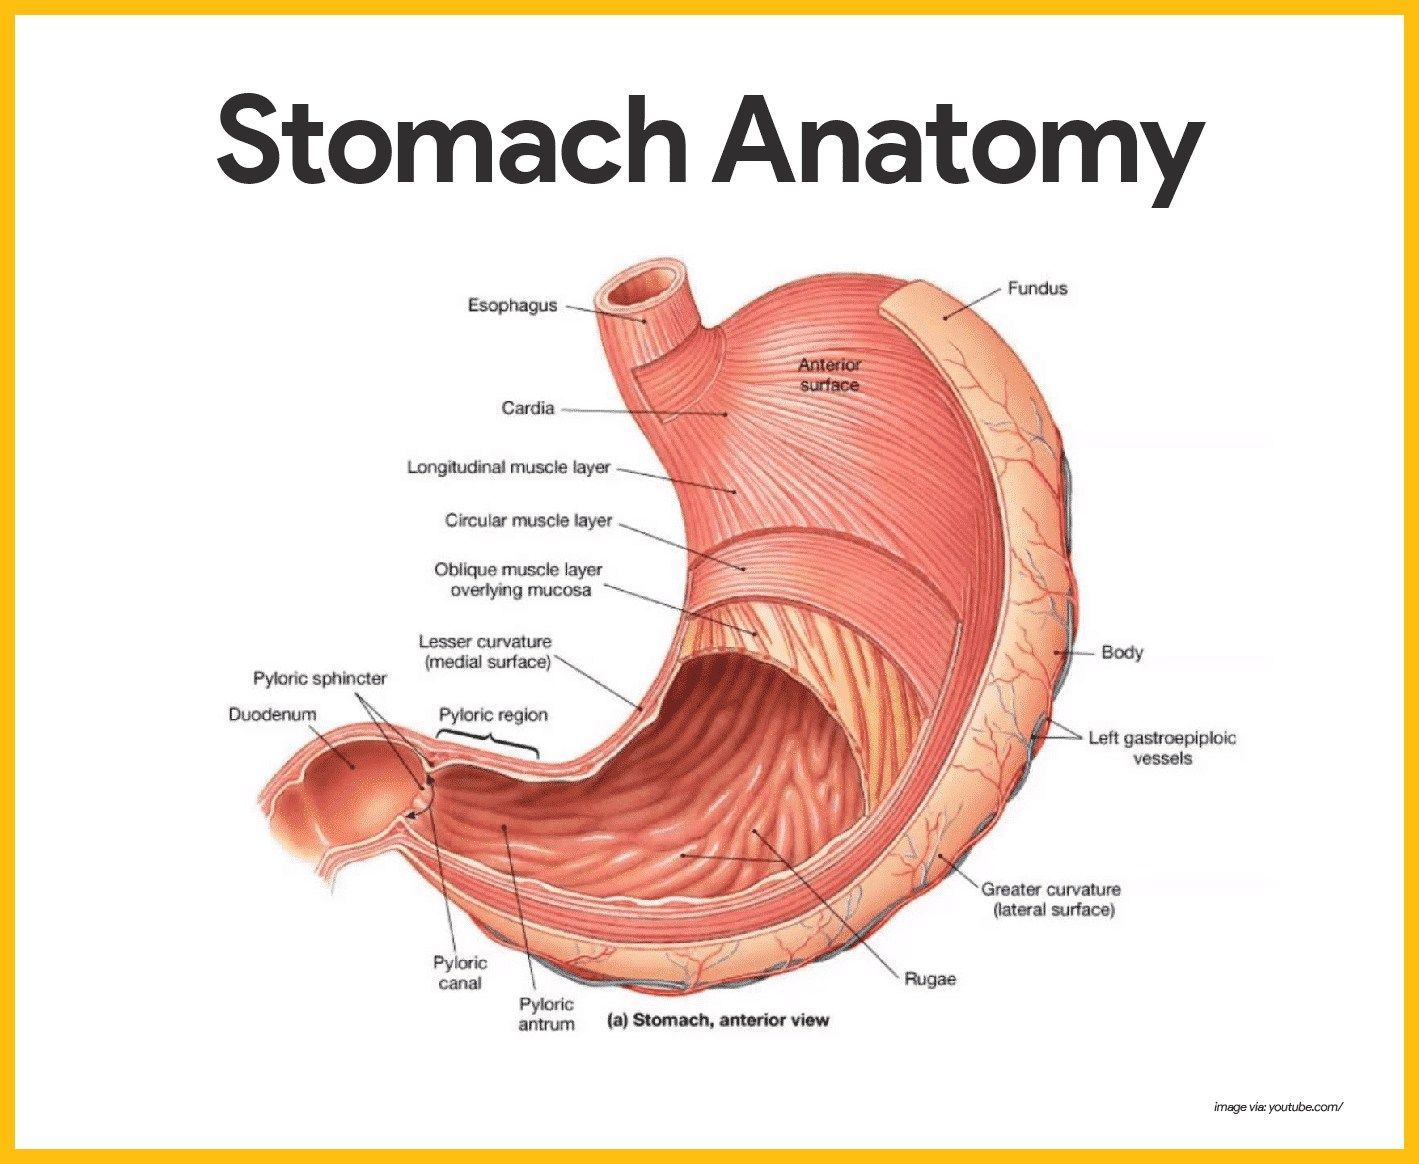 Stomach Diagram Anatomy Stomach Diagram Anatomy Digestive System Anatomy And Physiology Nurseslabs Digestive System Anatomy Anatomy Physiology Stomach Diagram